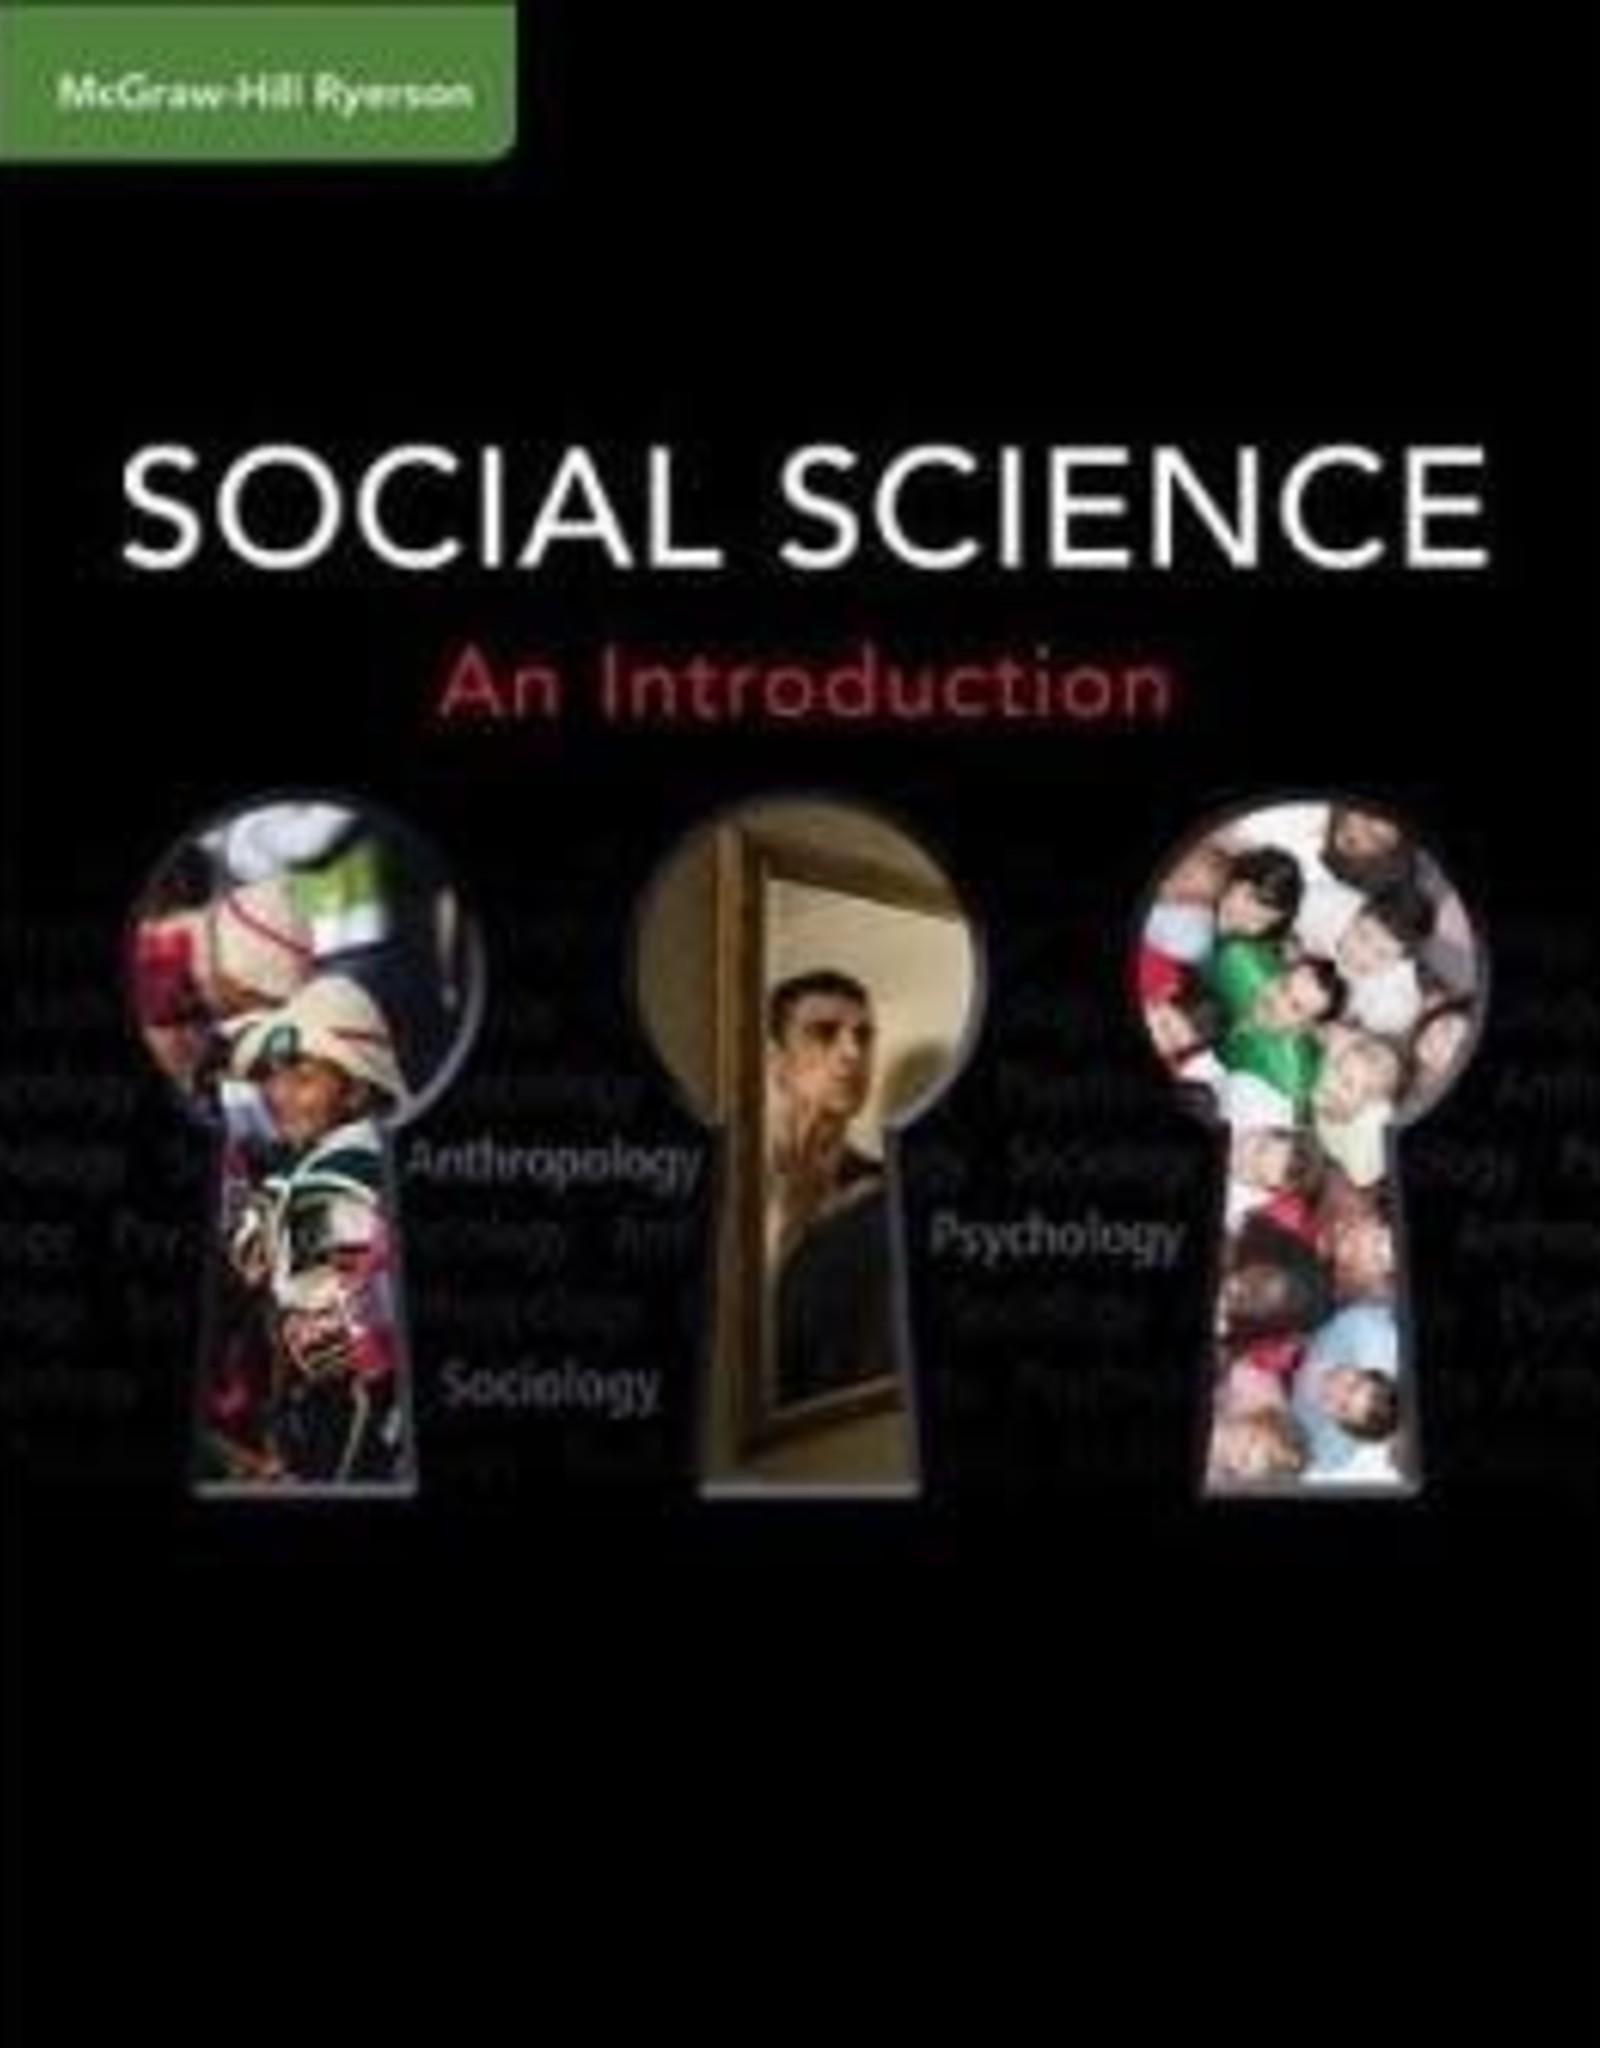 Anthropology, Psychology & Sociology, Grade 11, HSP3U